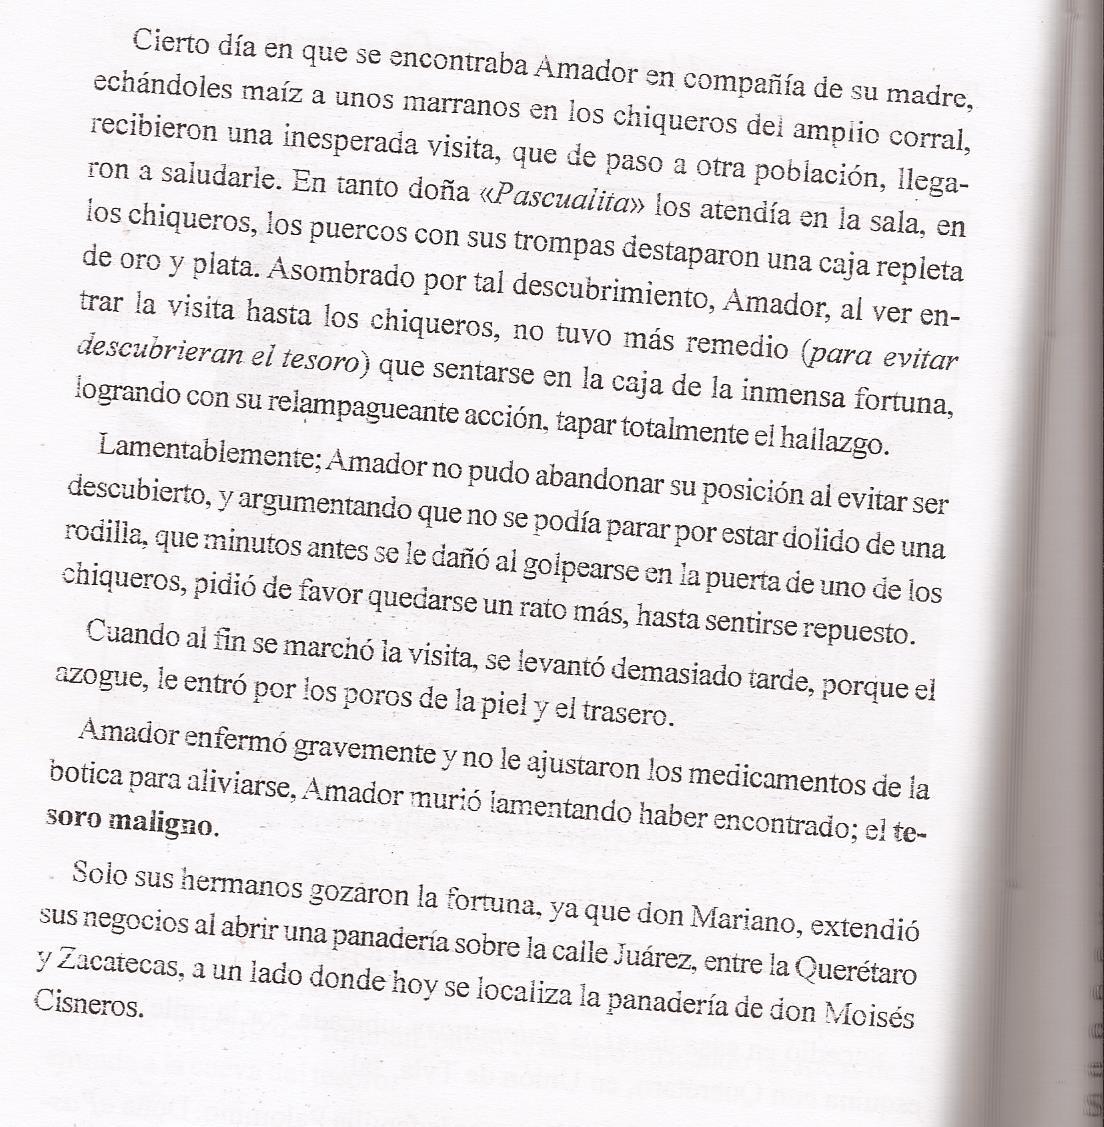 RELATOS DE TESOROS:  EL TESORO MALIGNO  2v1vqev